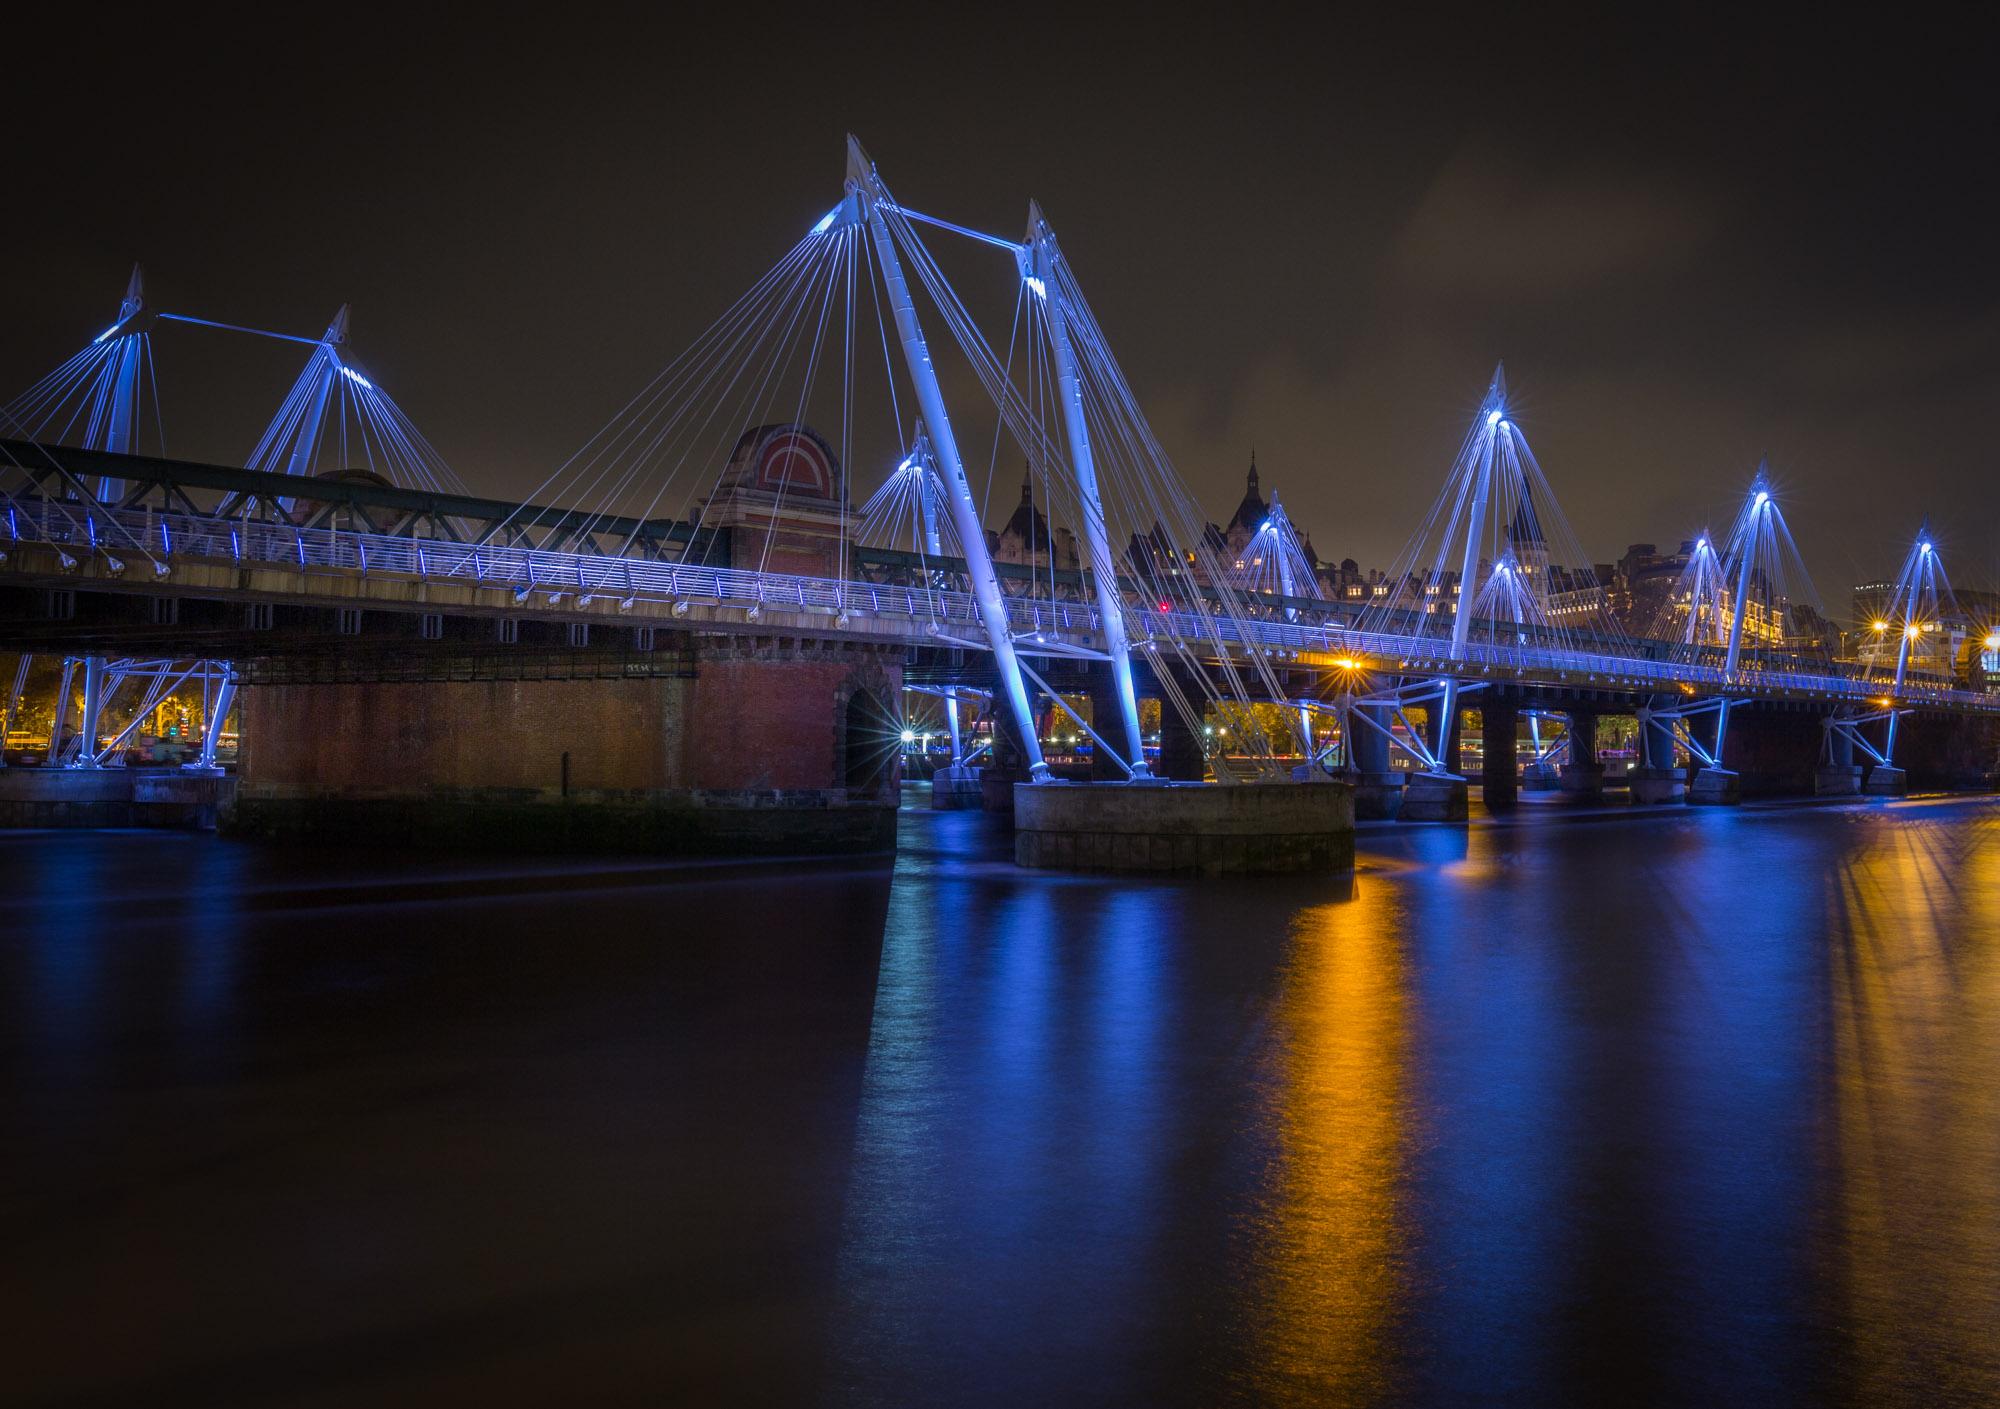 long exposure night photography of Hungerford Bridge in London UK